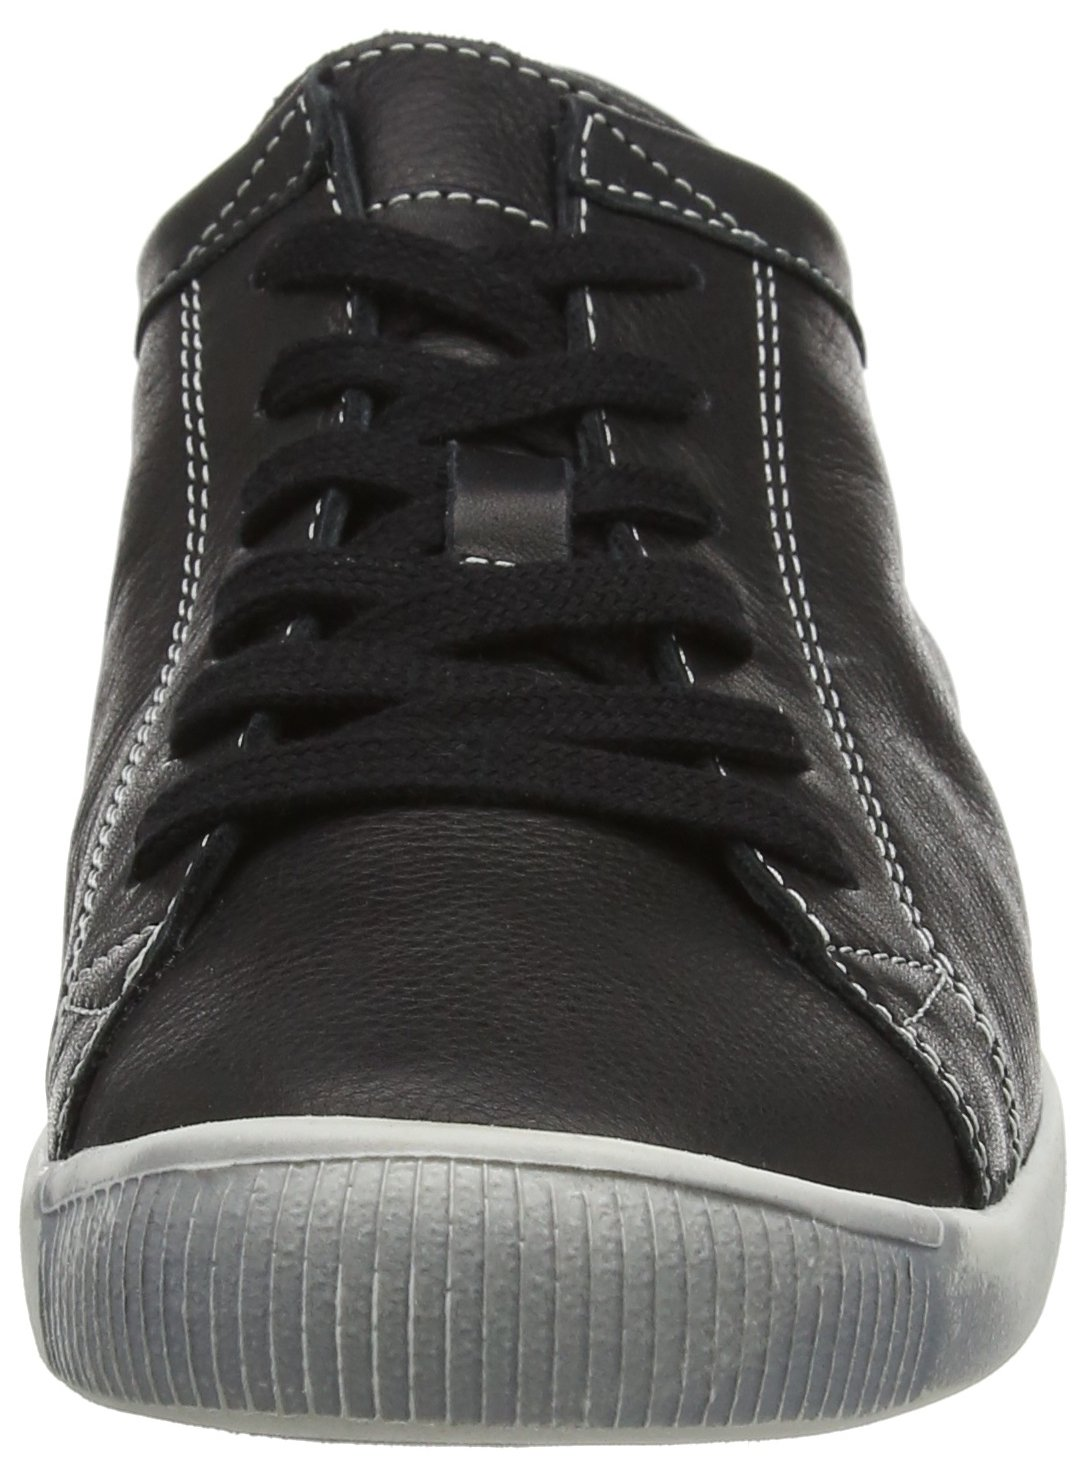 Softinos Women's Isla Sneaker US B01M63LK8K 36 M EU / US Sneaker 5.5-6 Black 7911f9